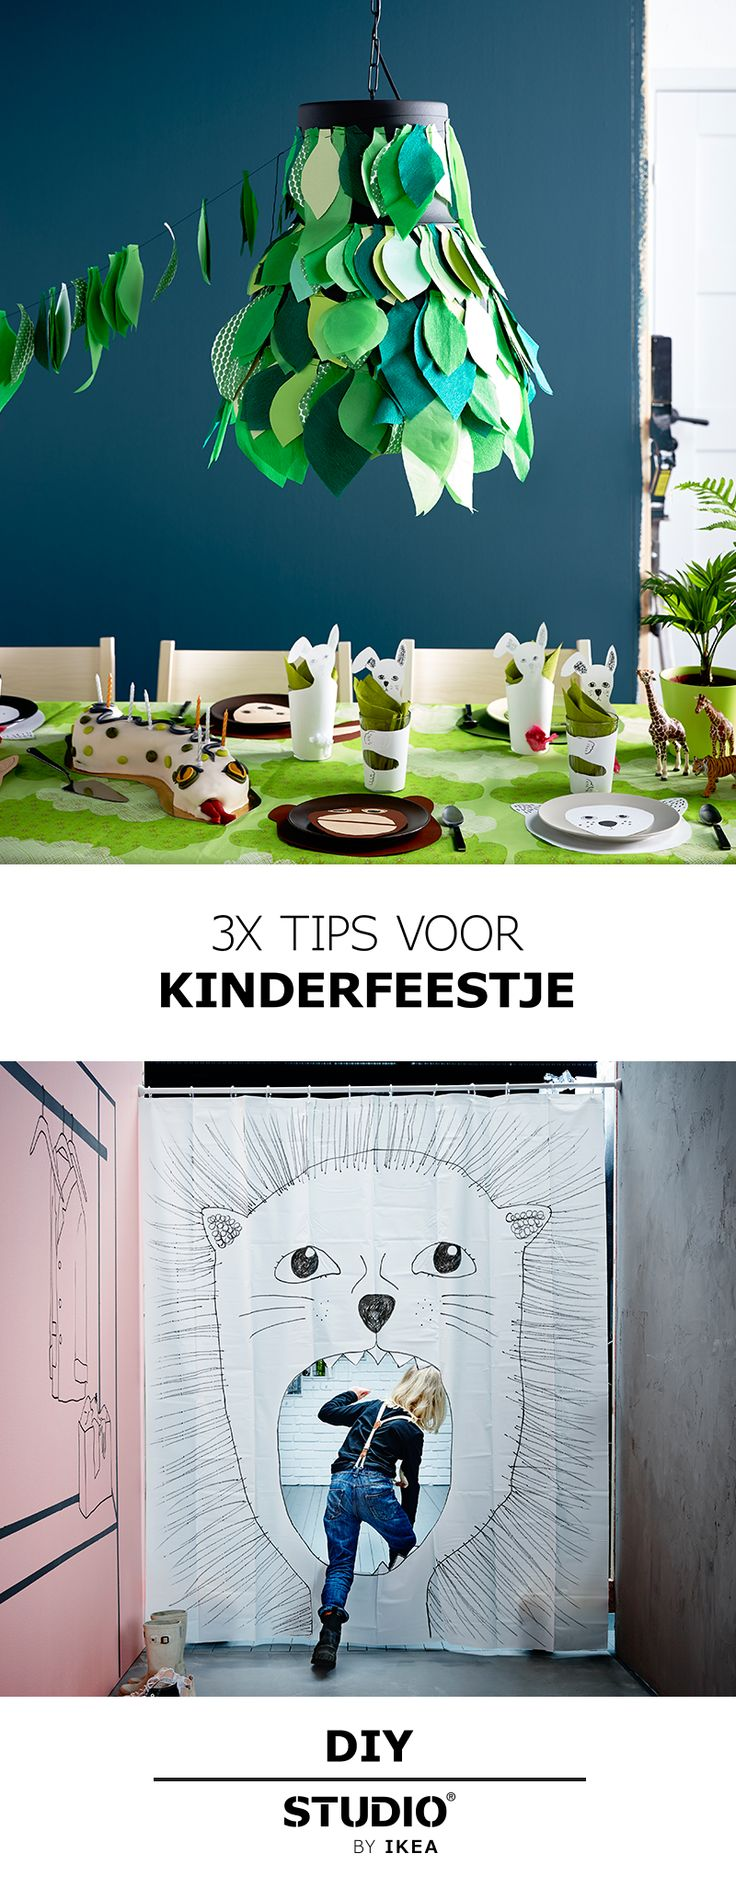 STUDIO by IKEA - 3x tips voor kinderfeestje   #STUDIObyIKEA #IKEA #IKEAnl…